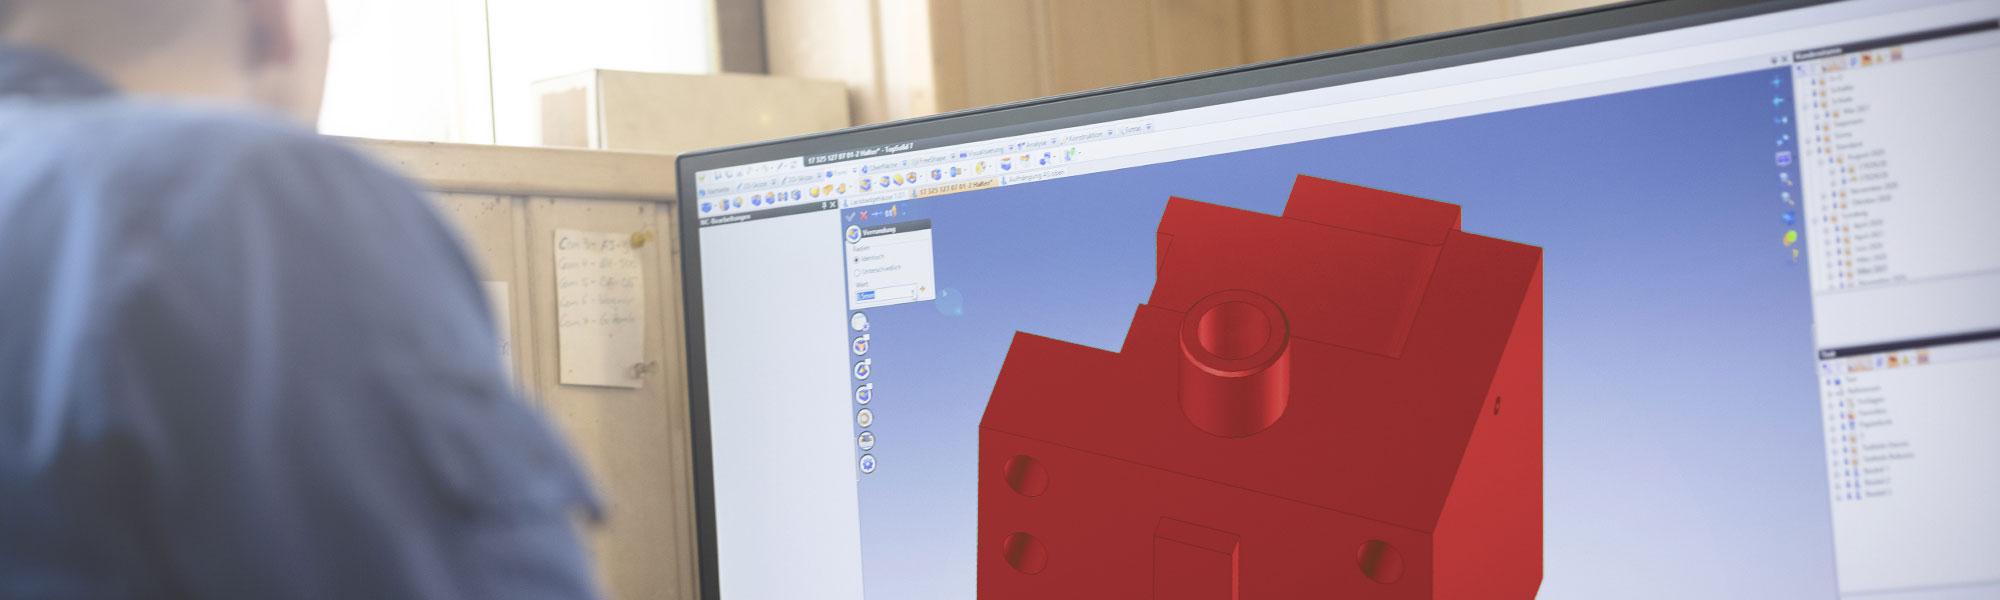 Kruse CAD/CAM Software System